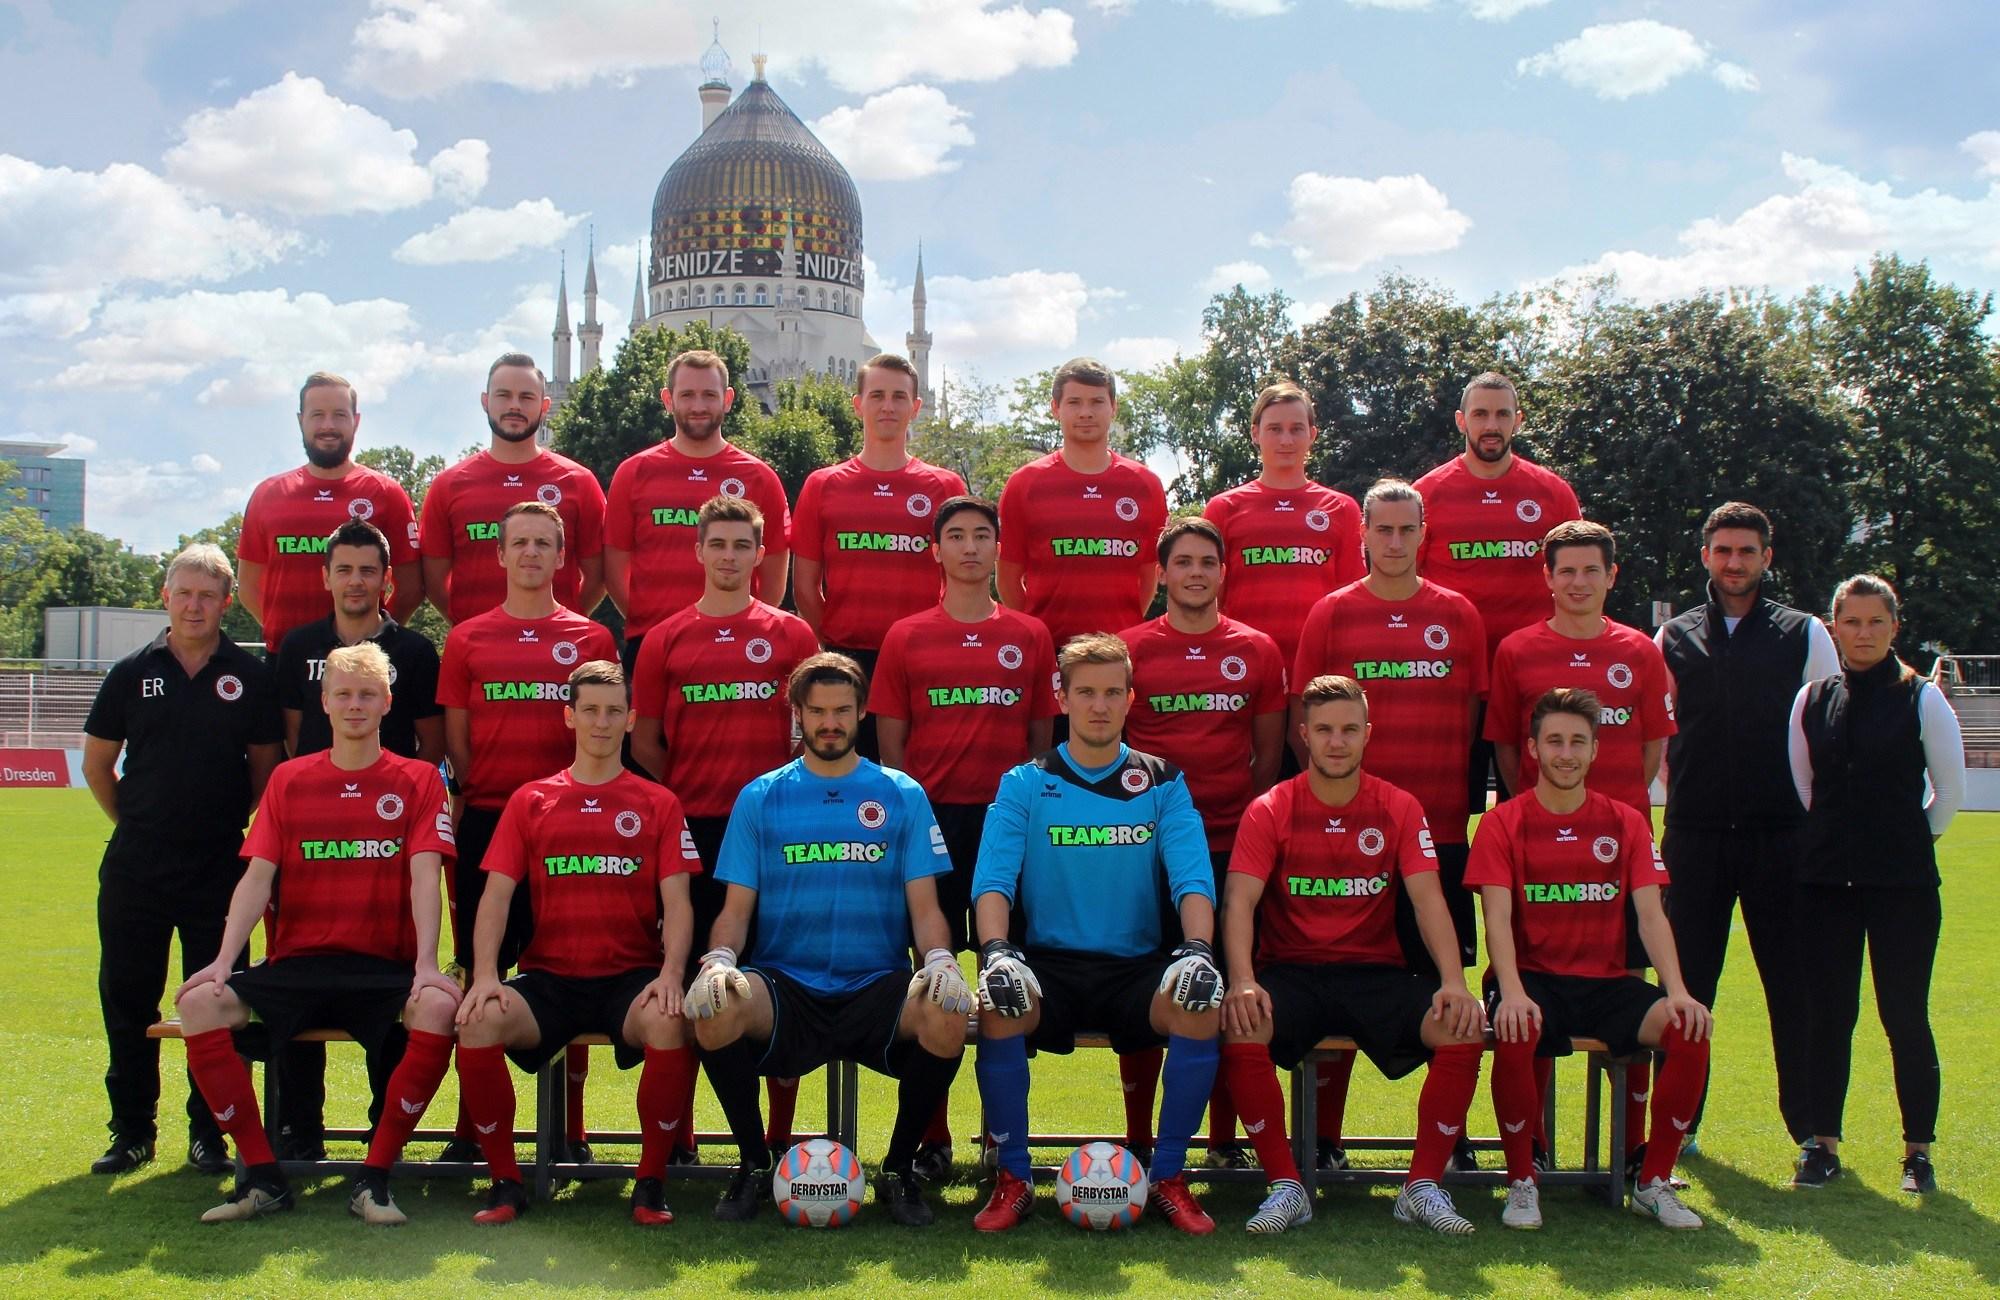 Mannschaftsfoto Dresdner SC 1898 Saison 2017/18